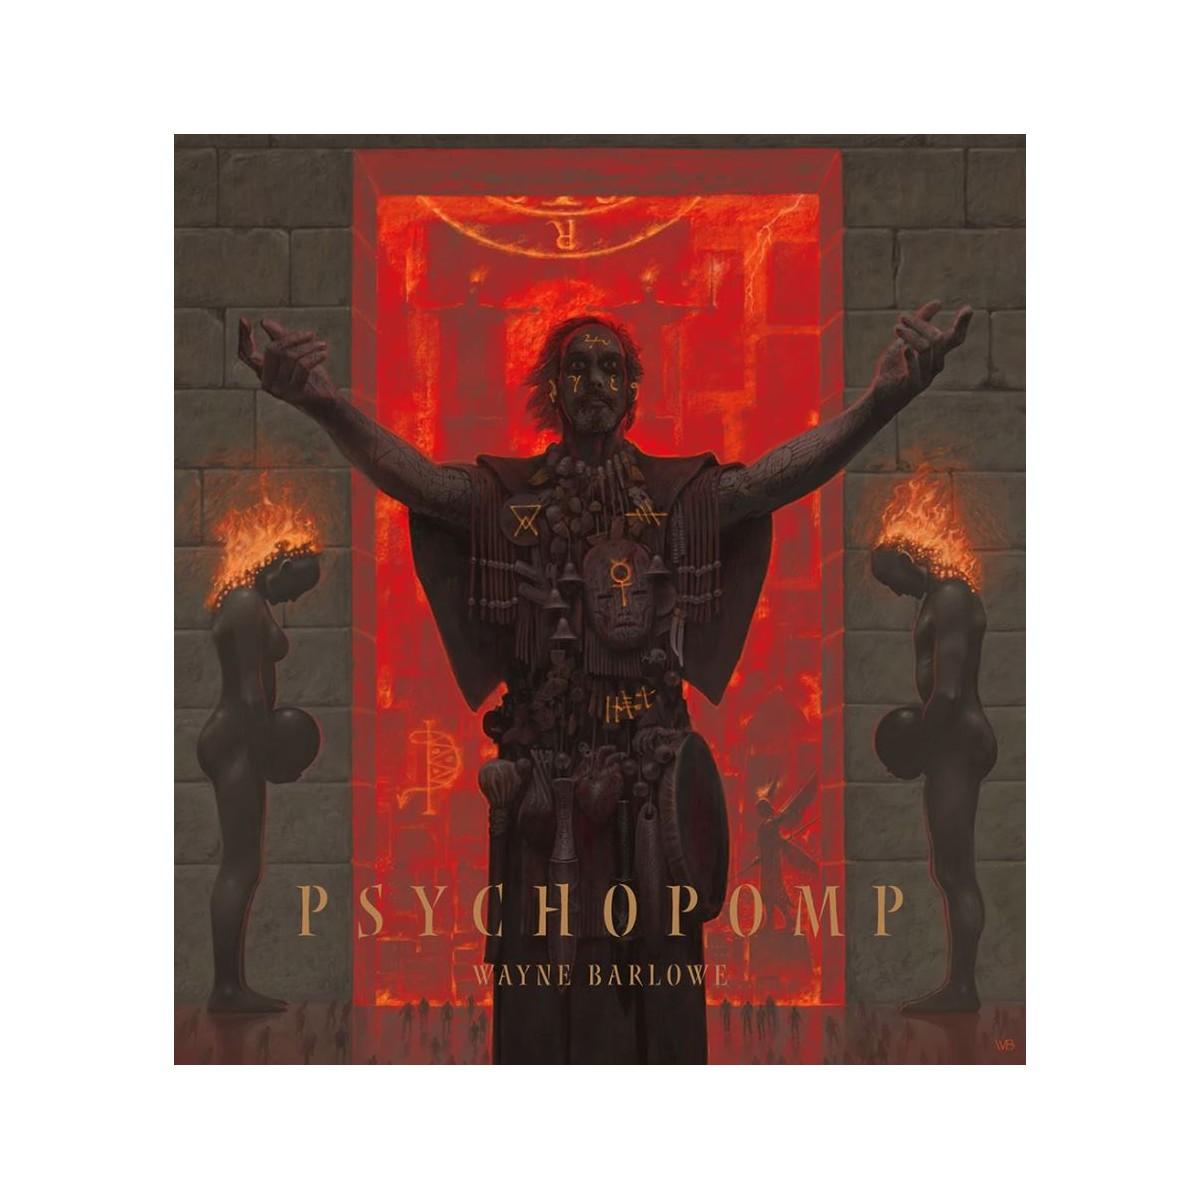 Wayne Barlowe - Psychopomp (Vorbestellung)